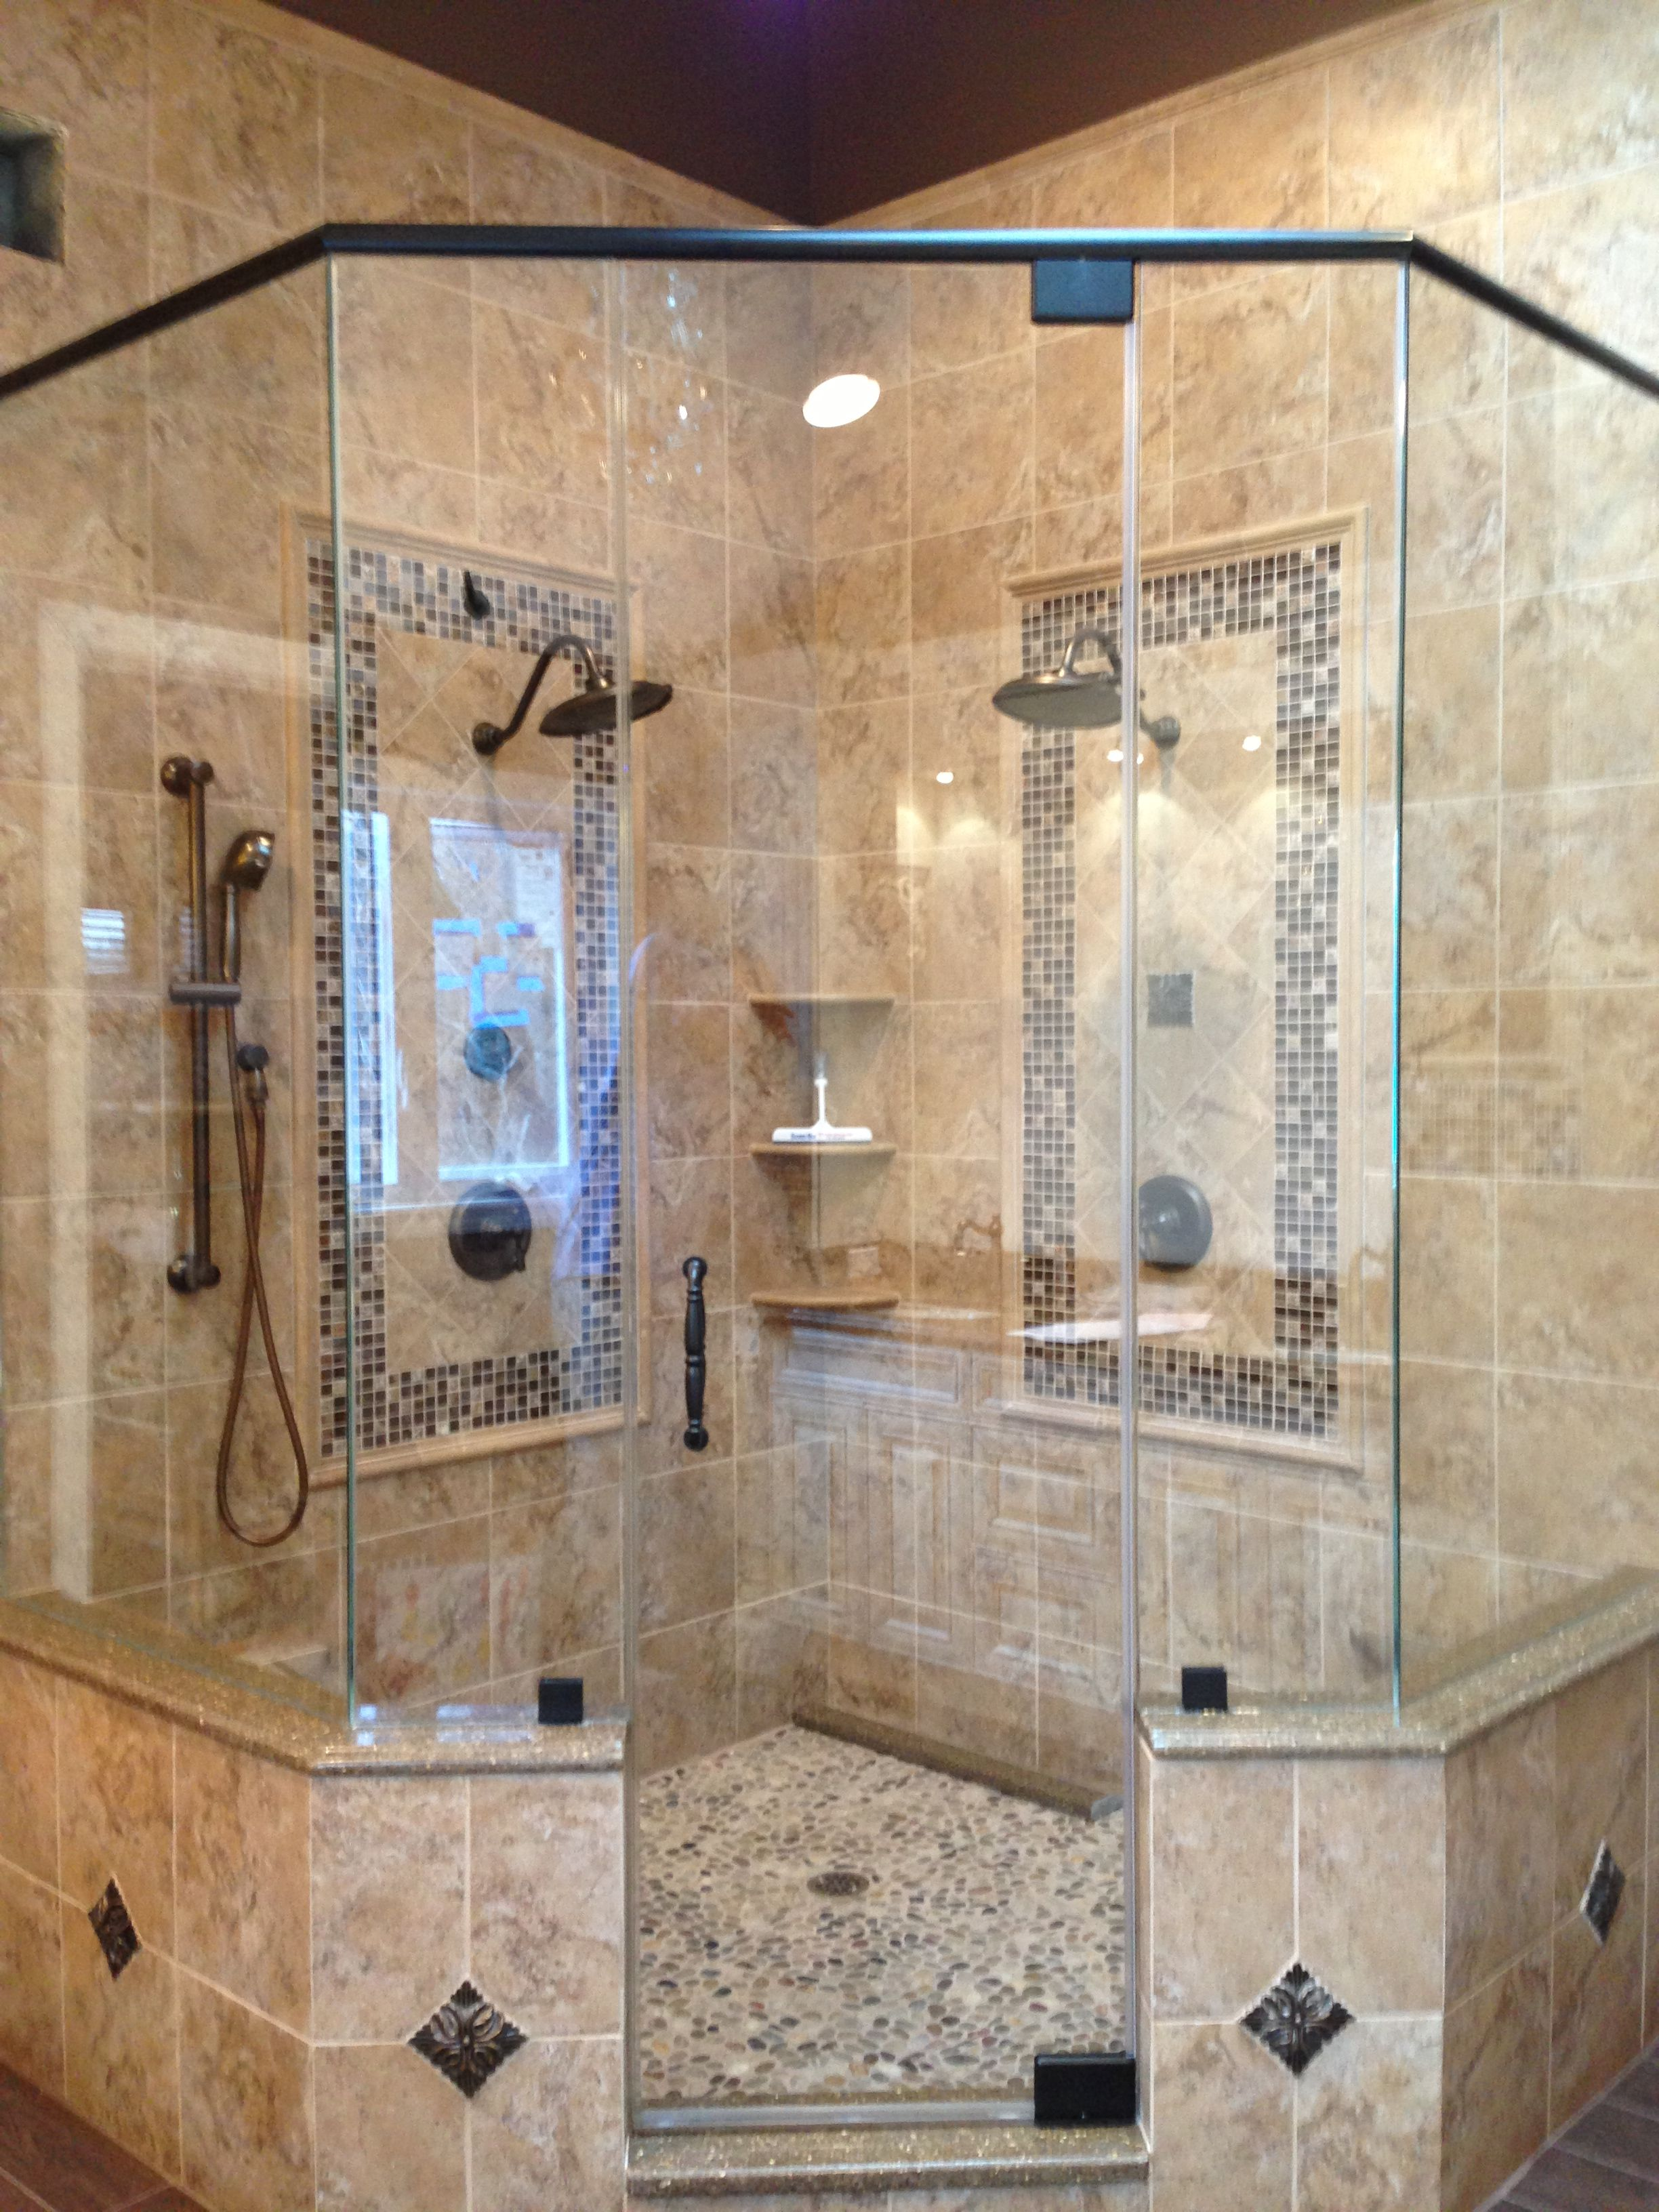 Neoangle semiframeless shower enclosure recently